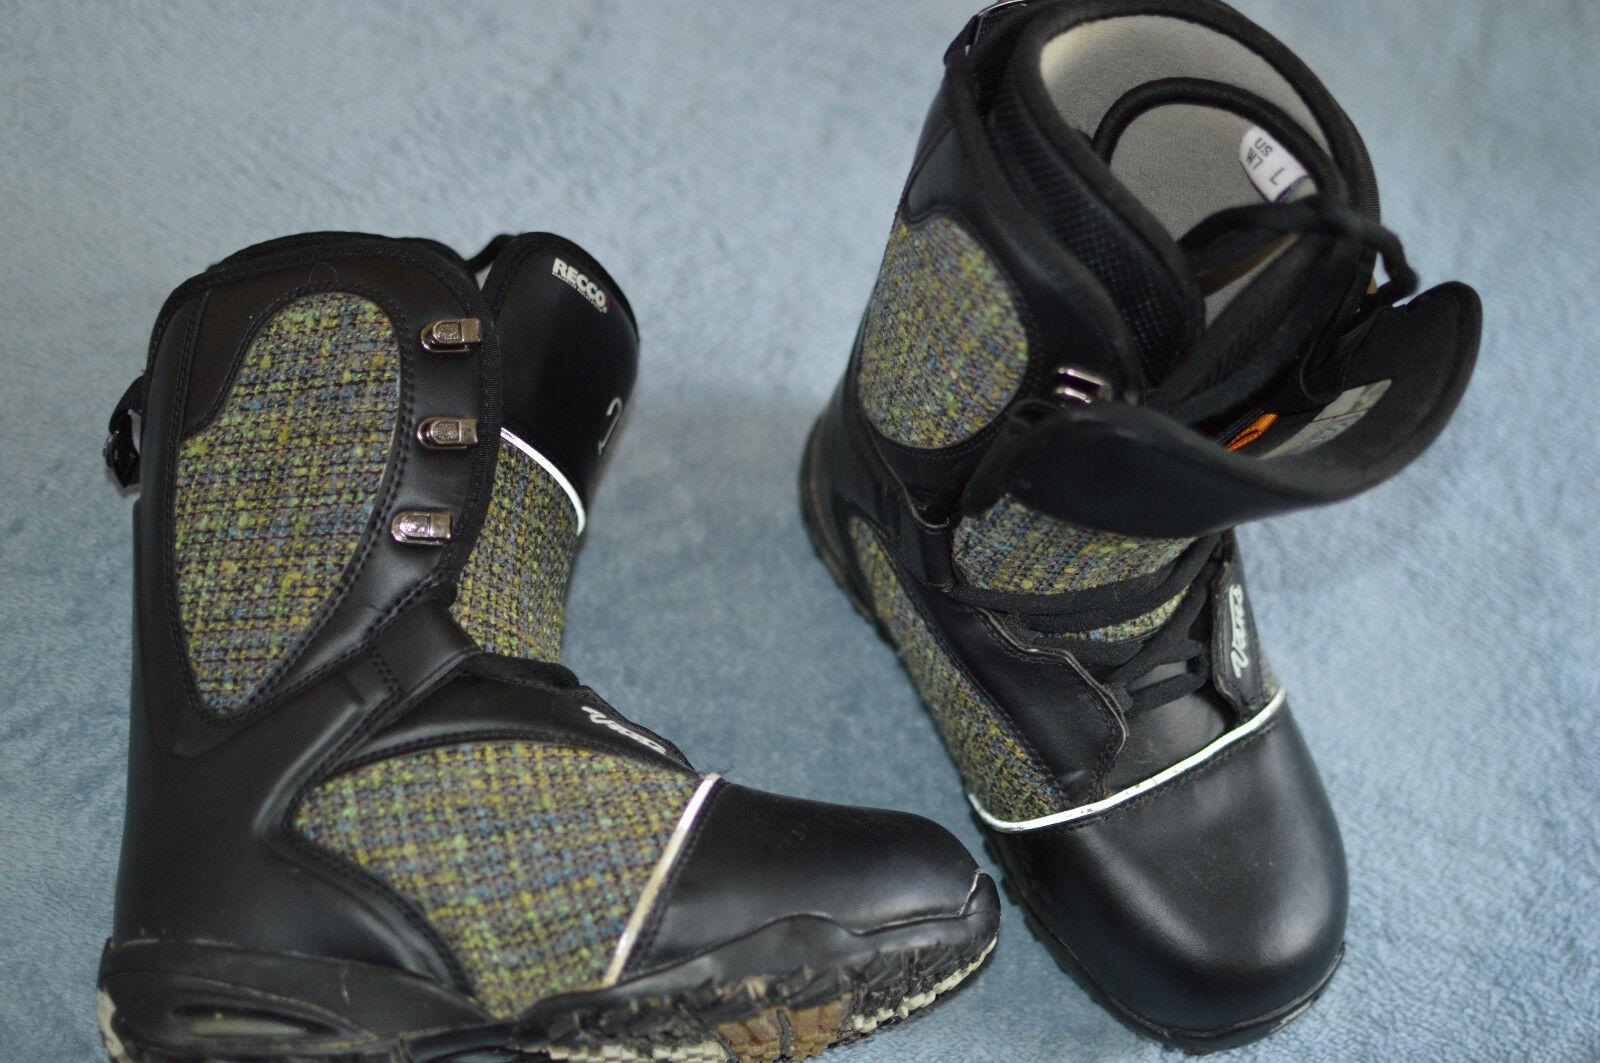 Vans Tara Dakides T3 3 Snowboard Boots Women Size 7